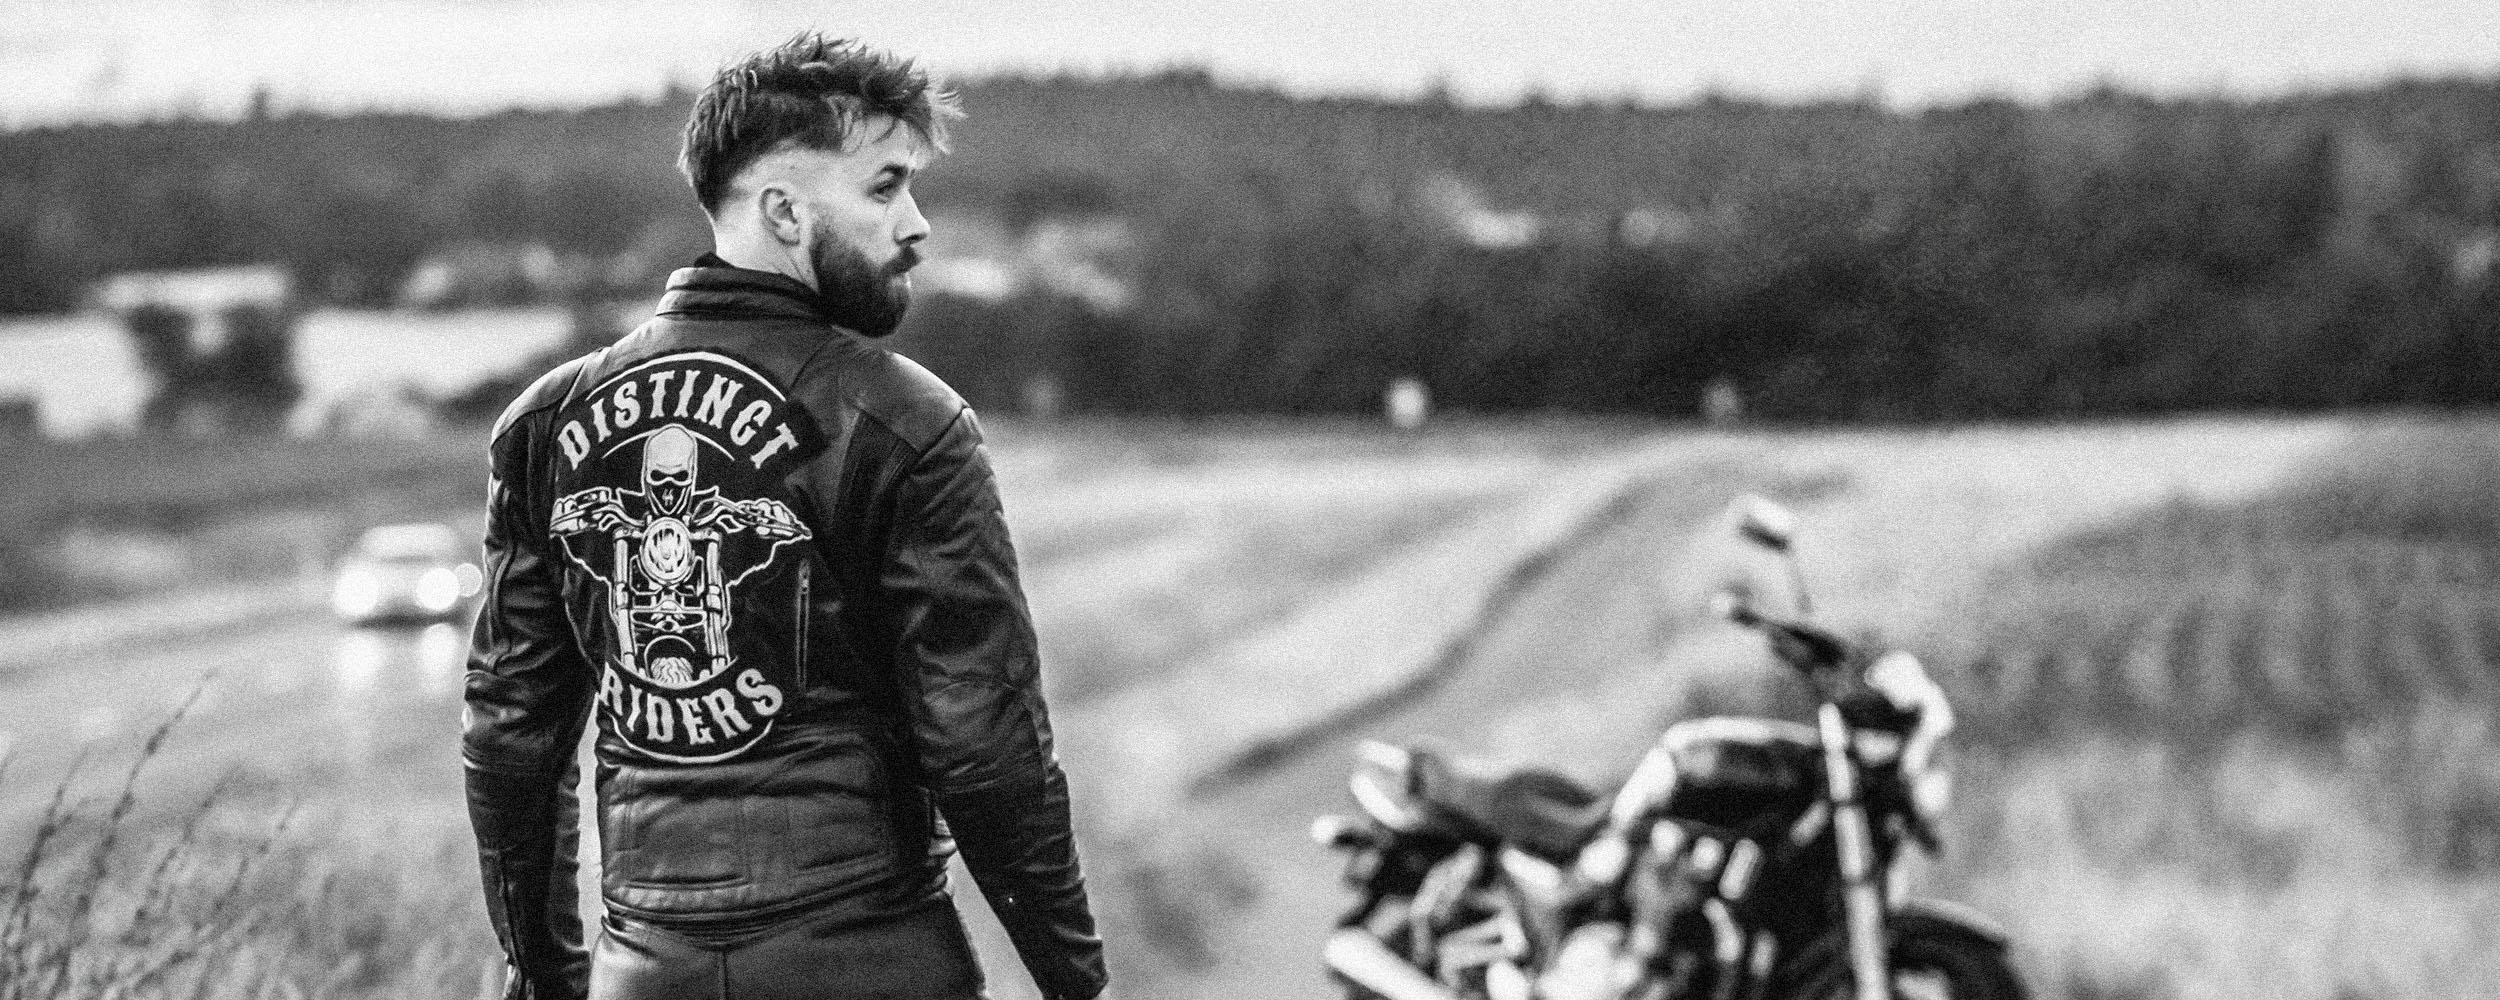 distinct-riders4